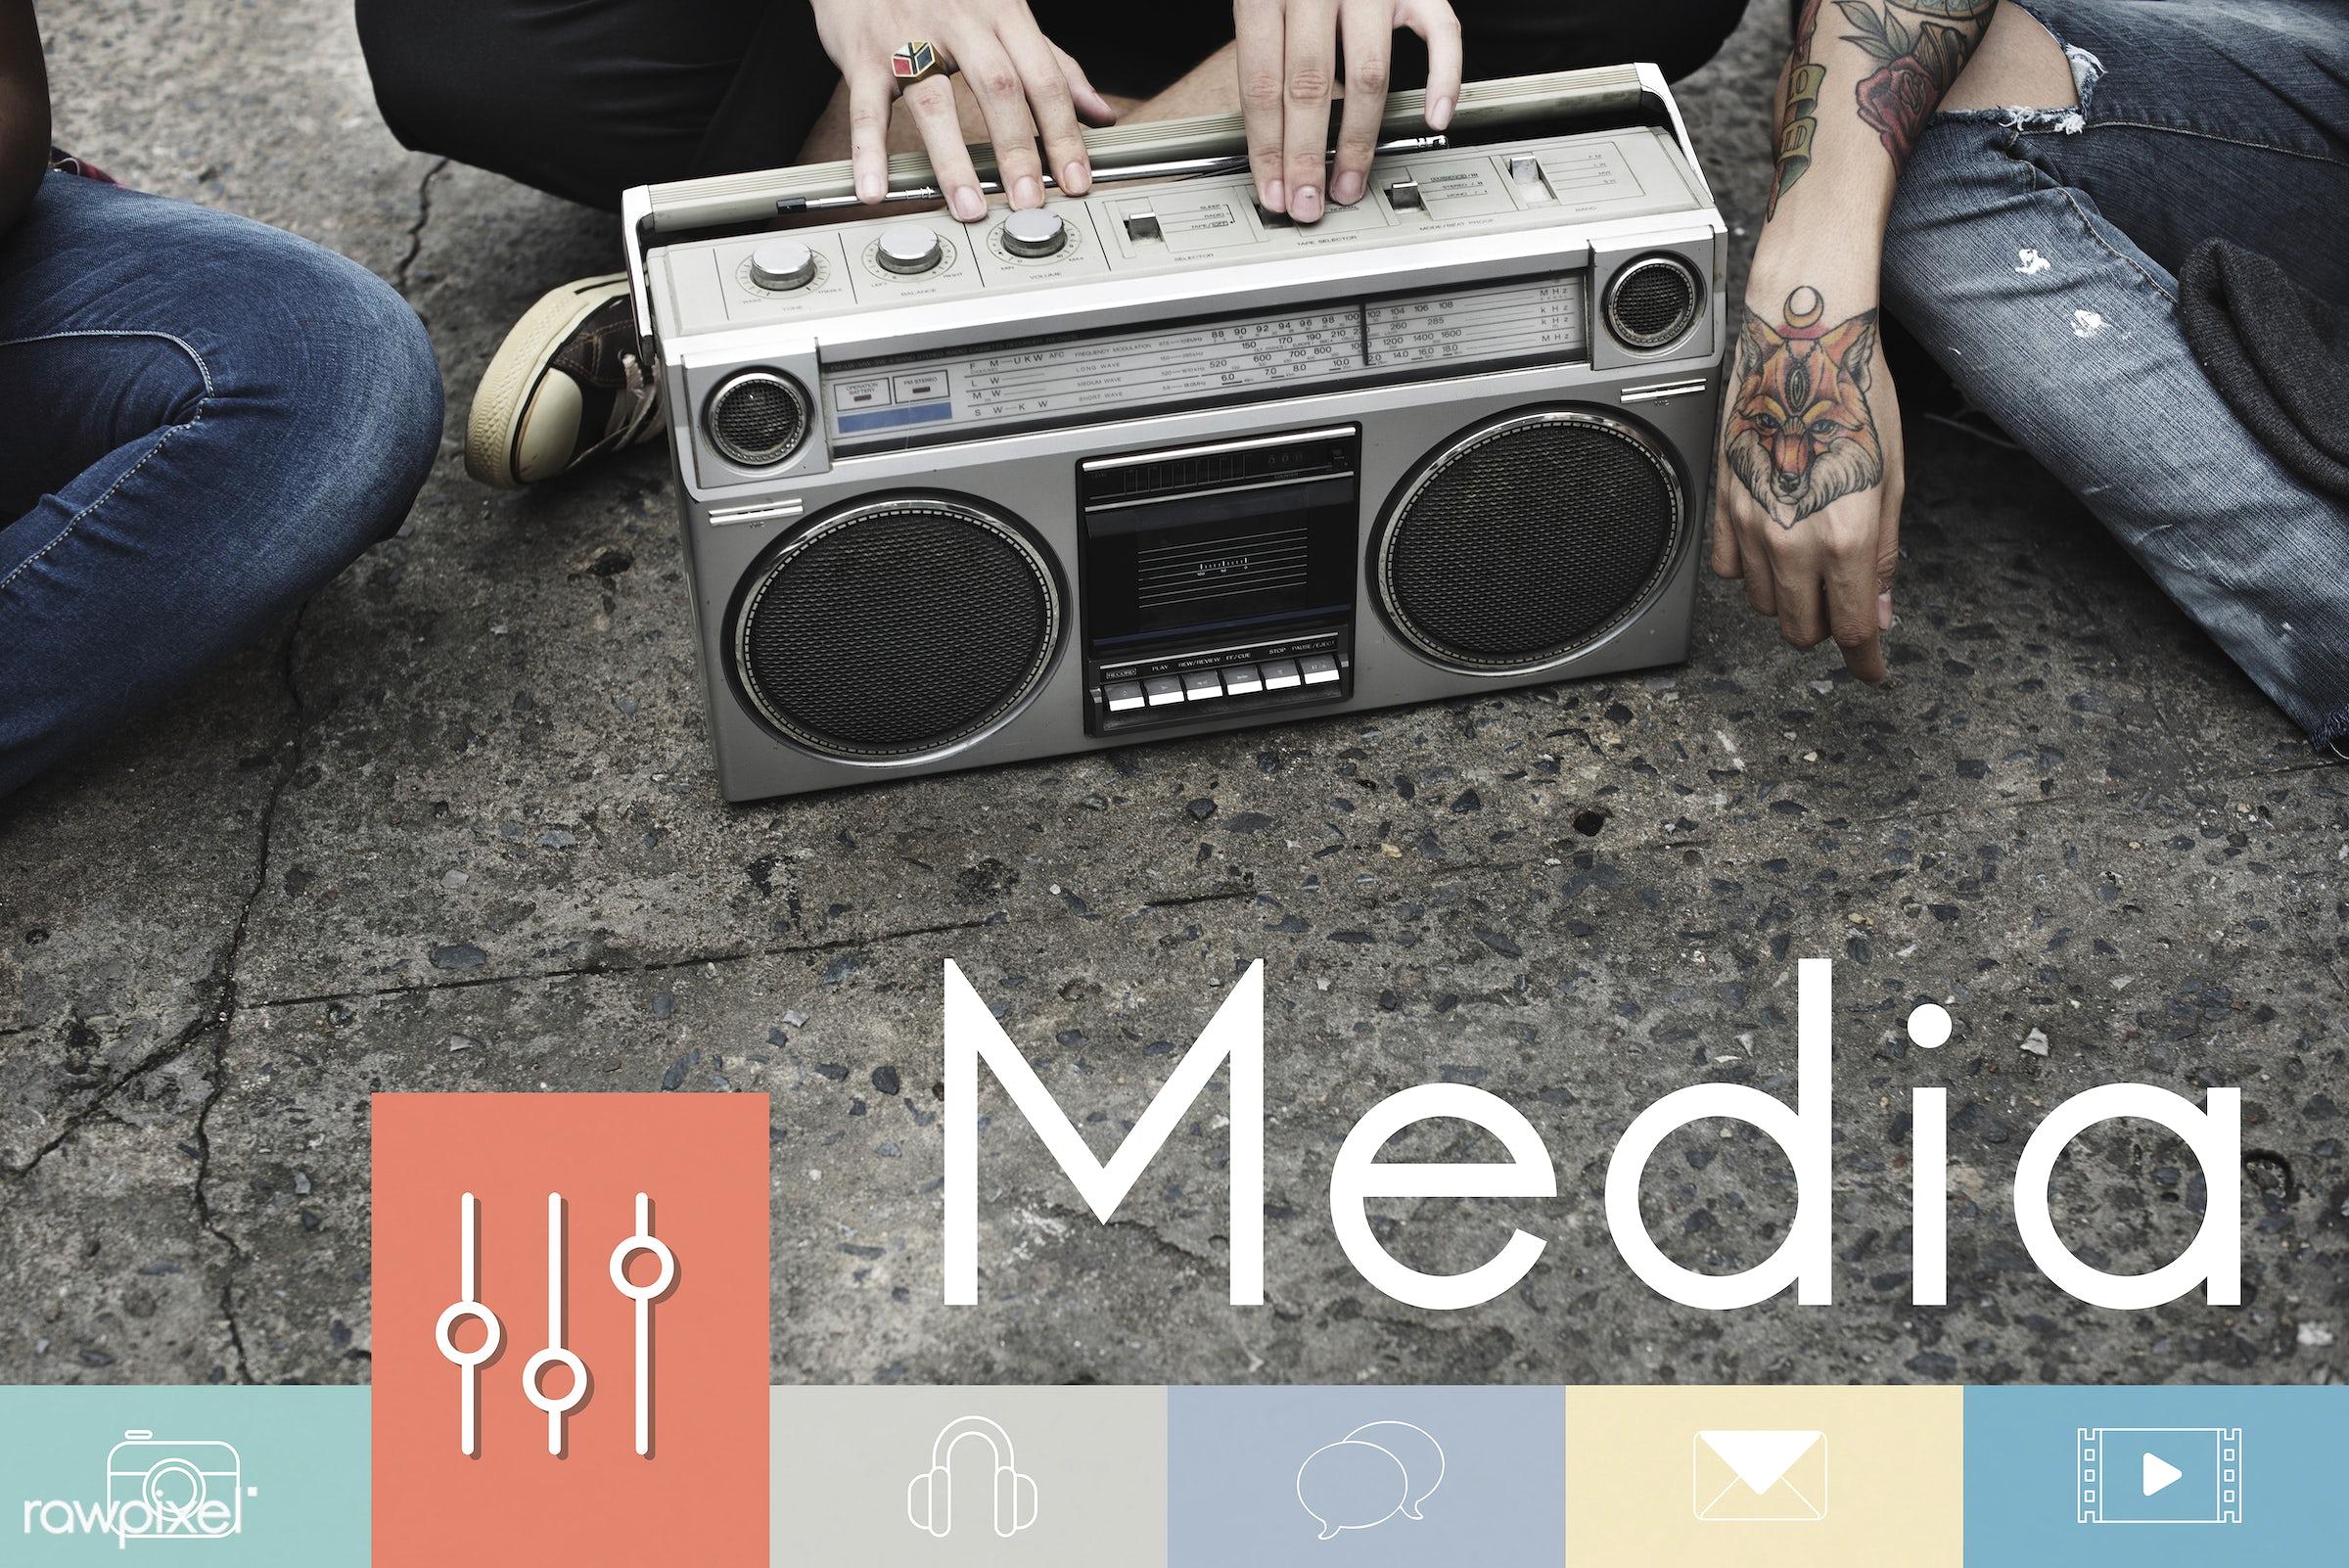 audio, box, button, connection, digital, enjoyment, entertain, entertainment, equalizer, hands, harmony, headphones, headset...